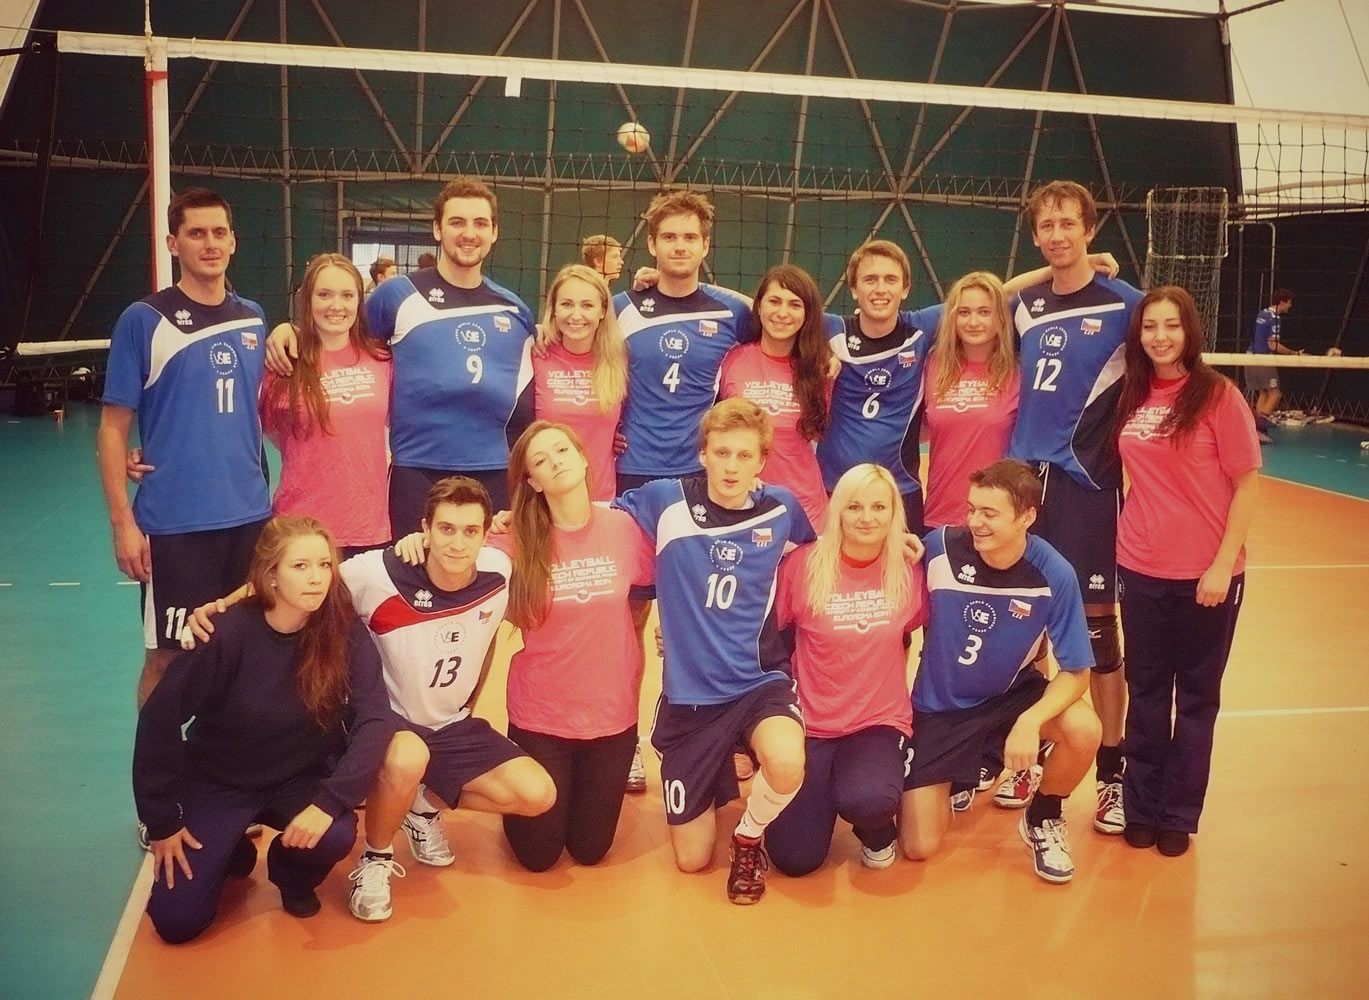 Volejbalisté reprezentovali na mezinárodním turnaji Euroroma 2014